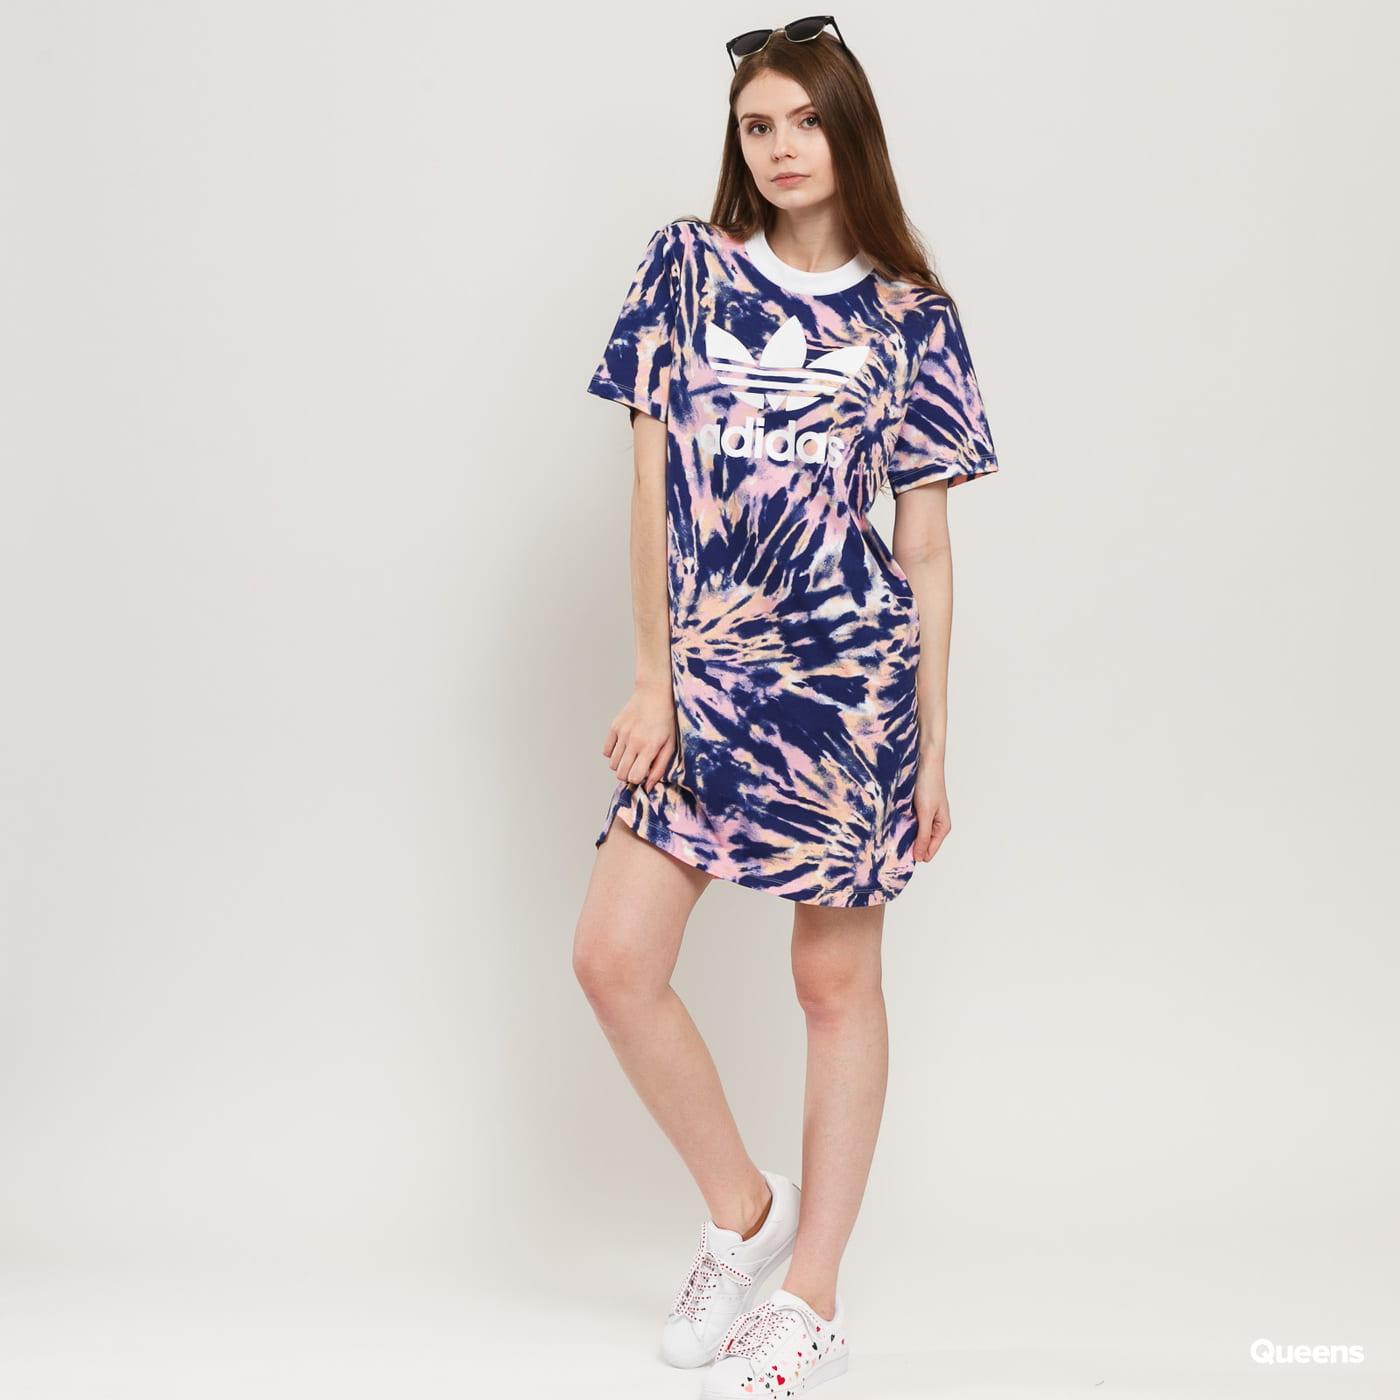 adidas female kleid wholesale e0840 1916c